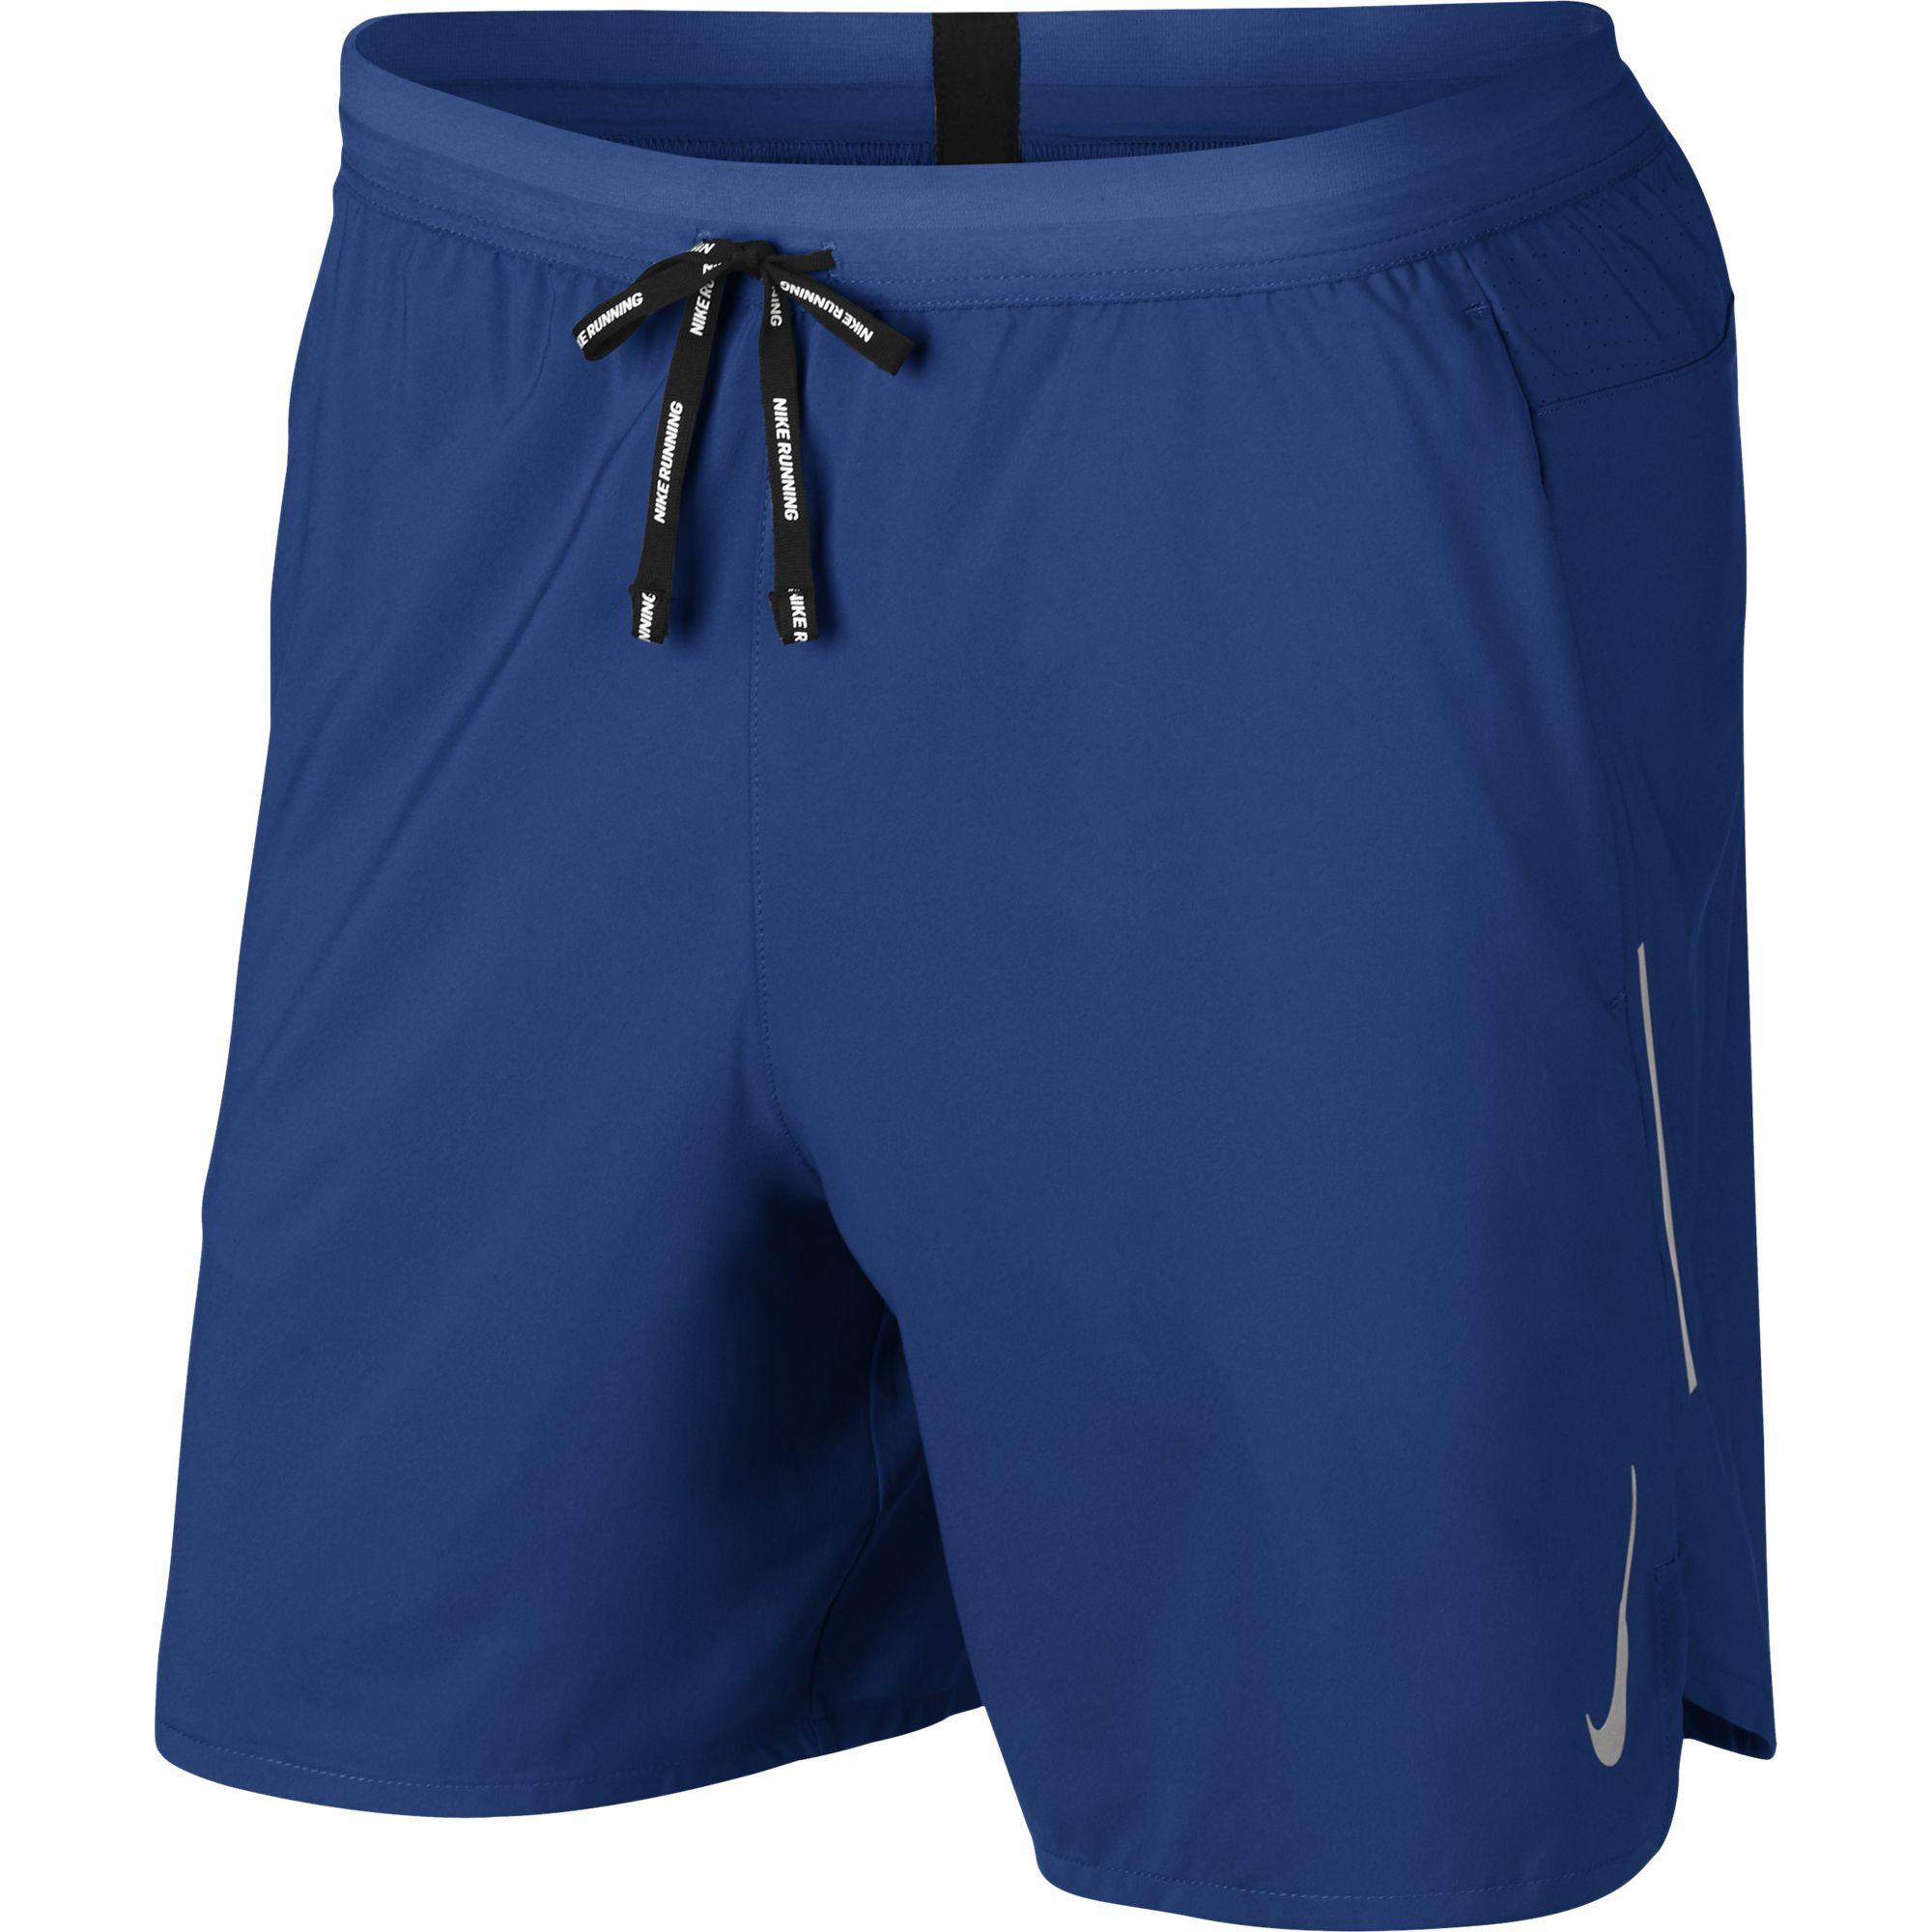 "Nike Flex Stride 2in1 Shorts 7"" in Blau"